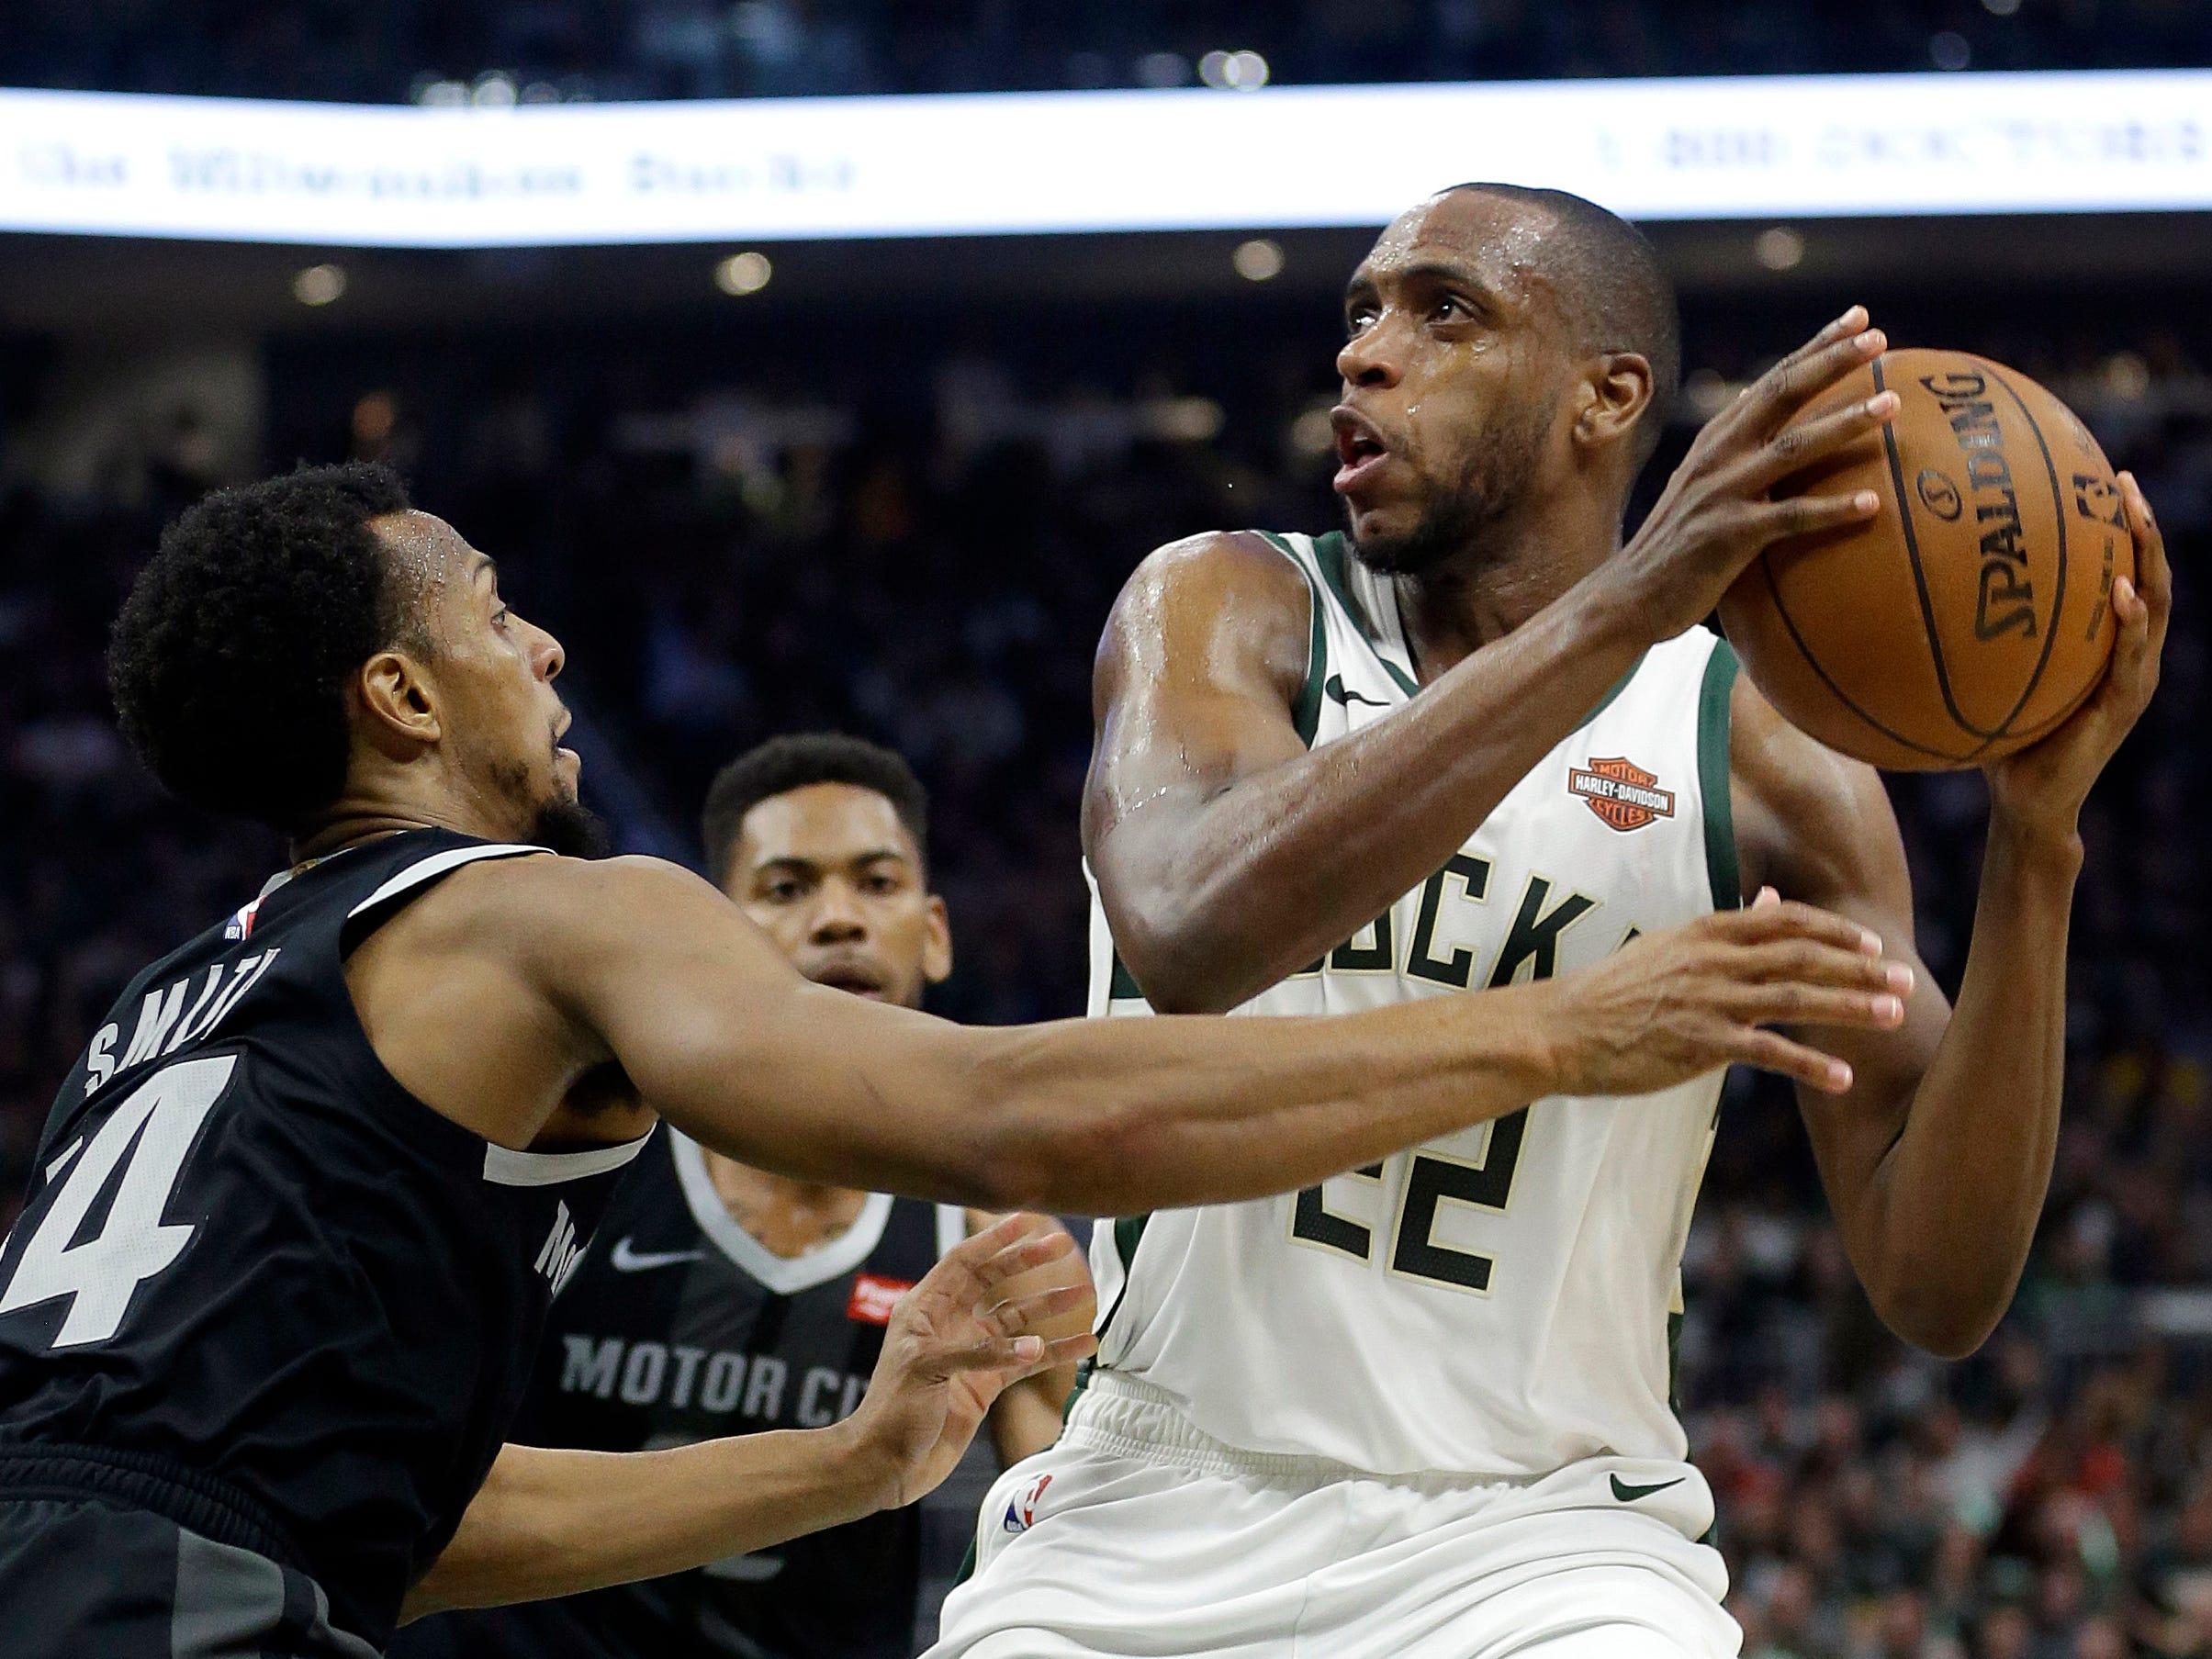 Milwaukee Bucks' Khris Middleton shoots against Detroit Pistons' Ish Smith during the second half.